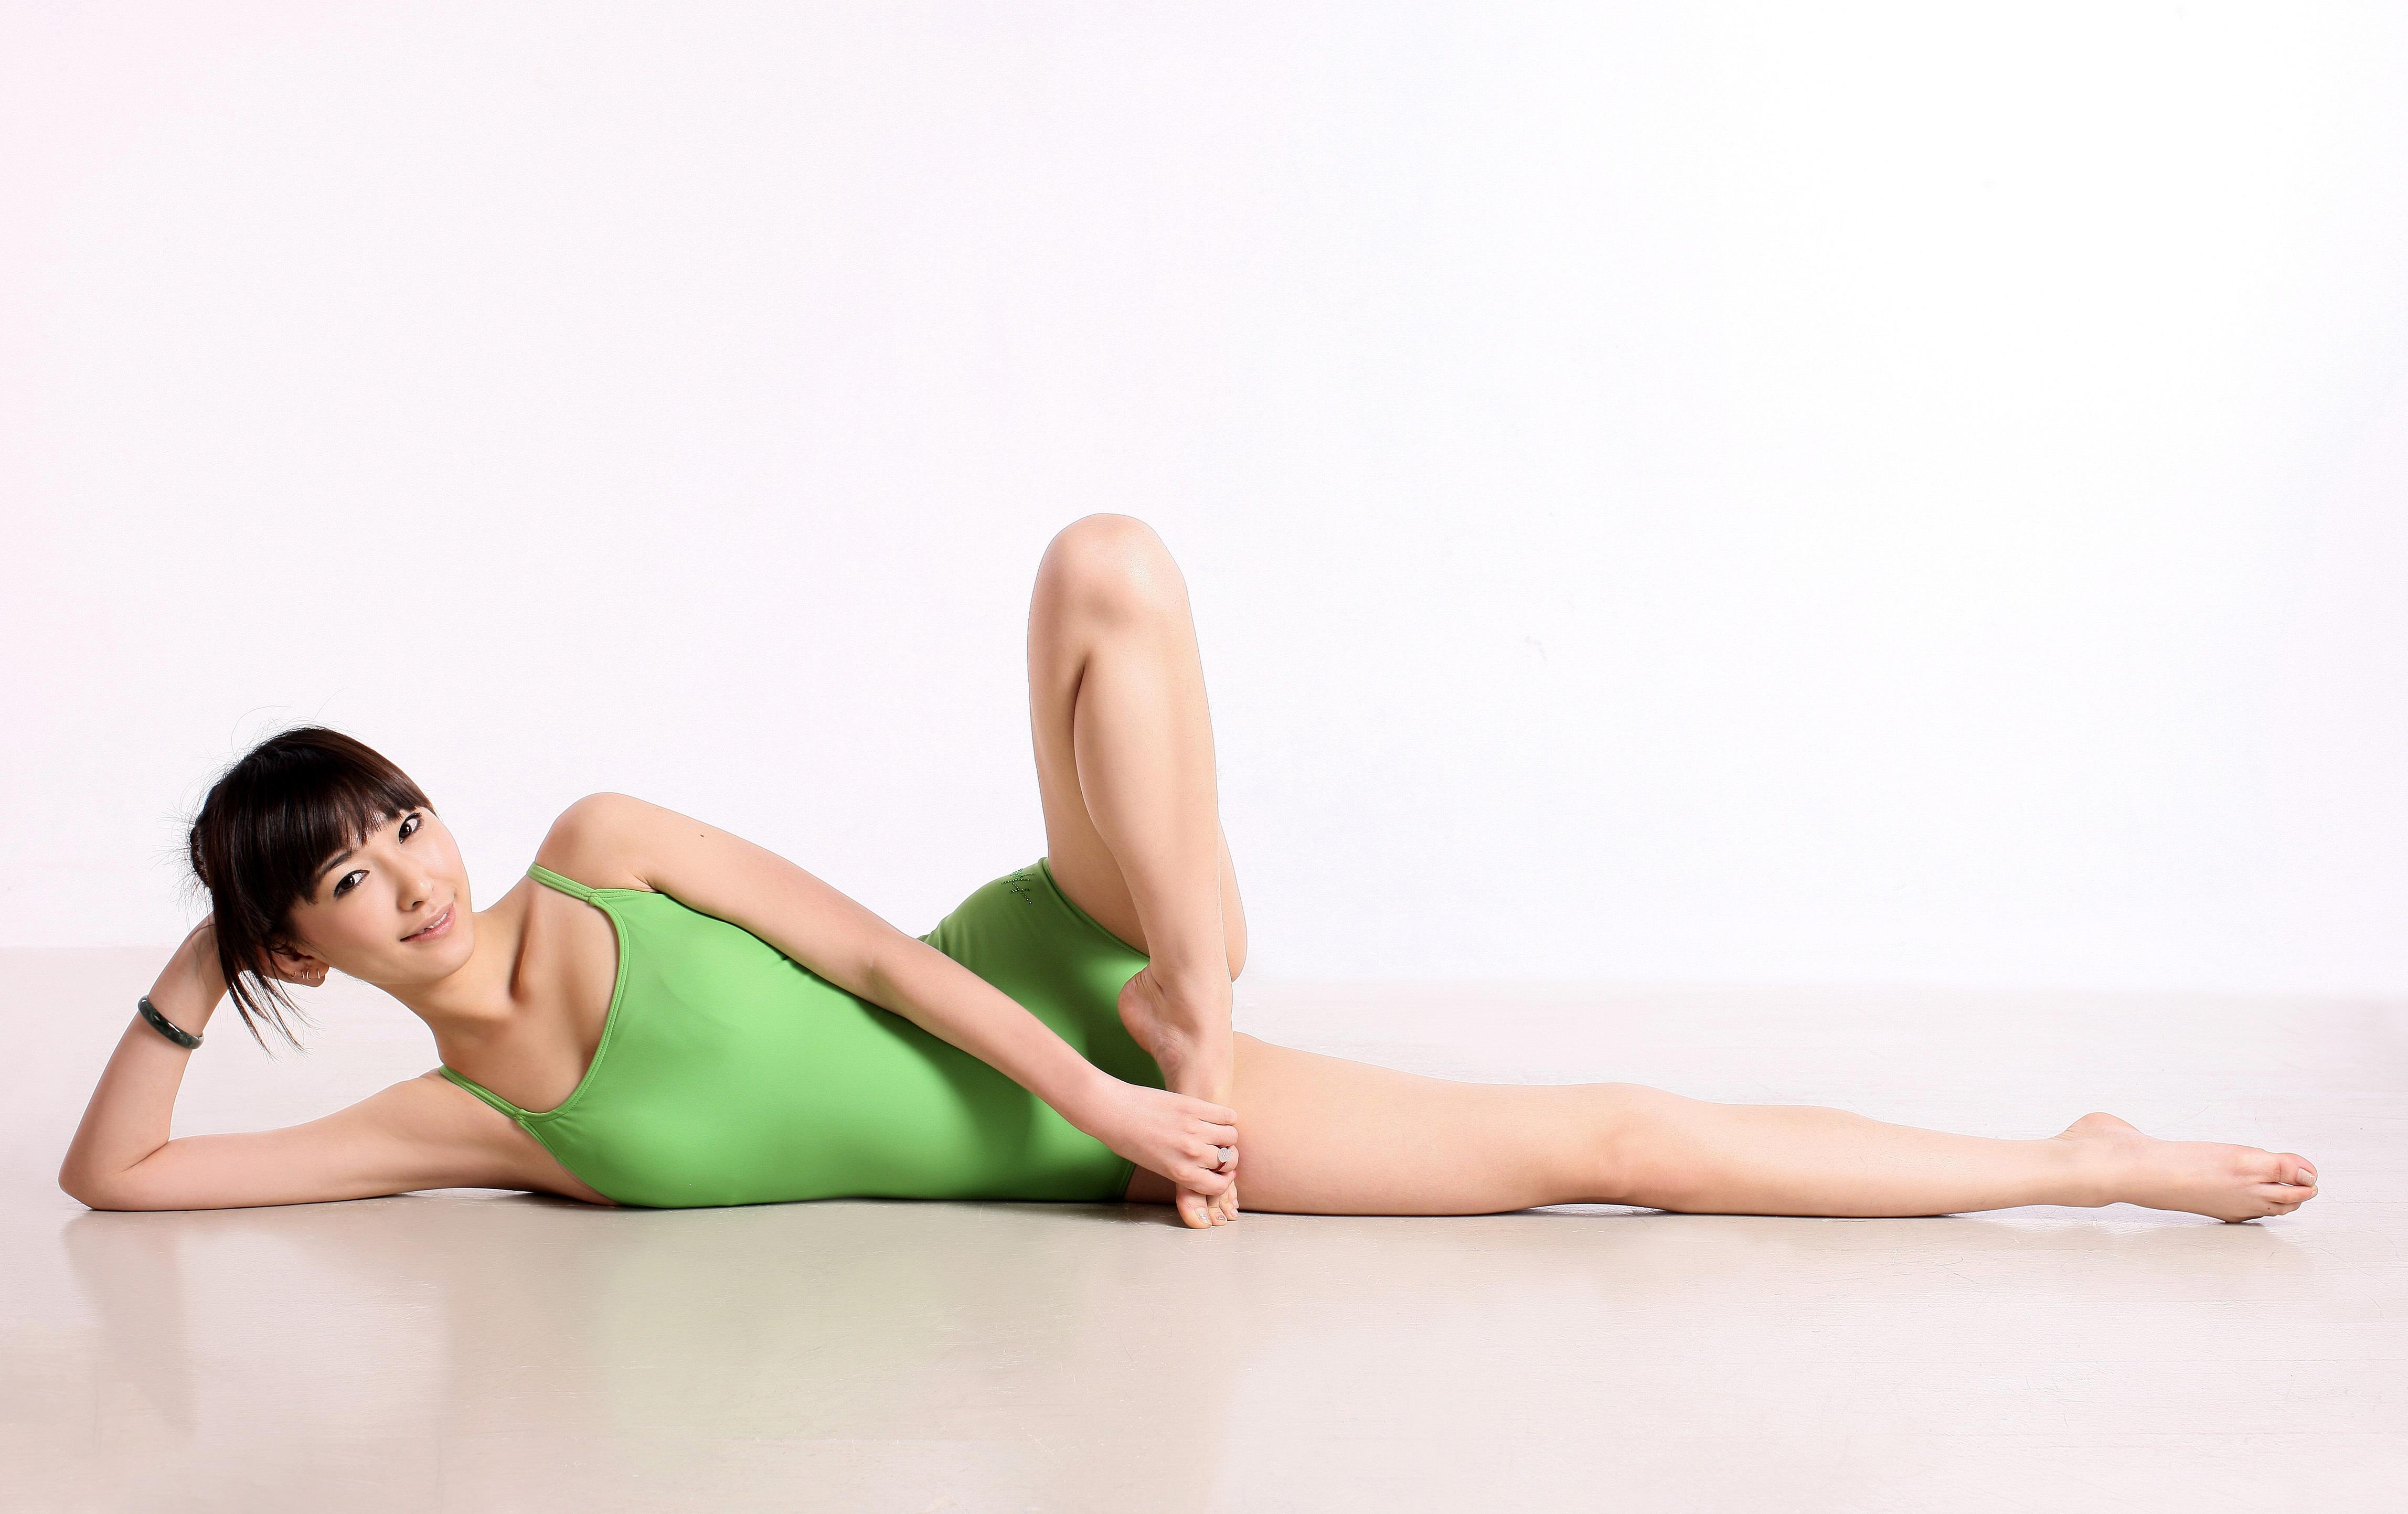 Cuerpo de baile - 3 part 9